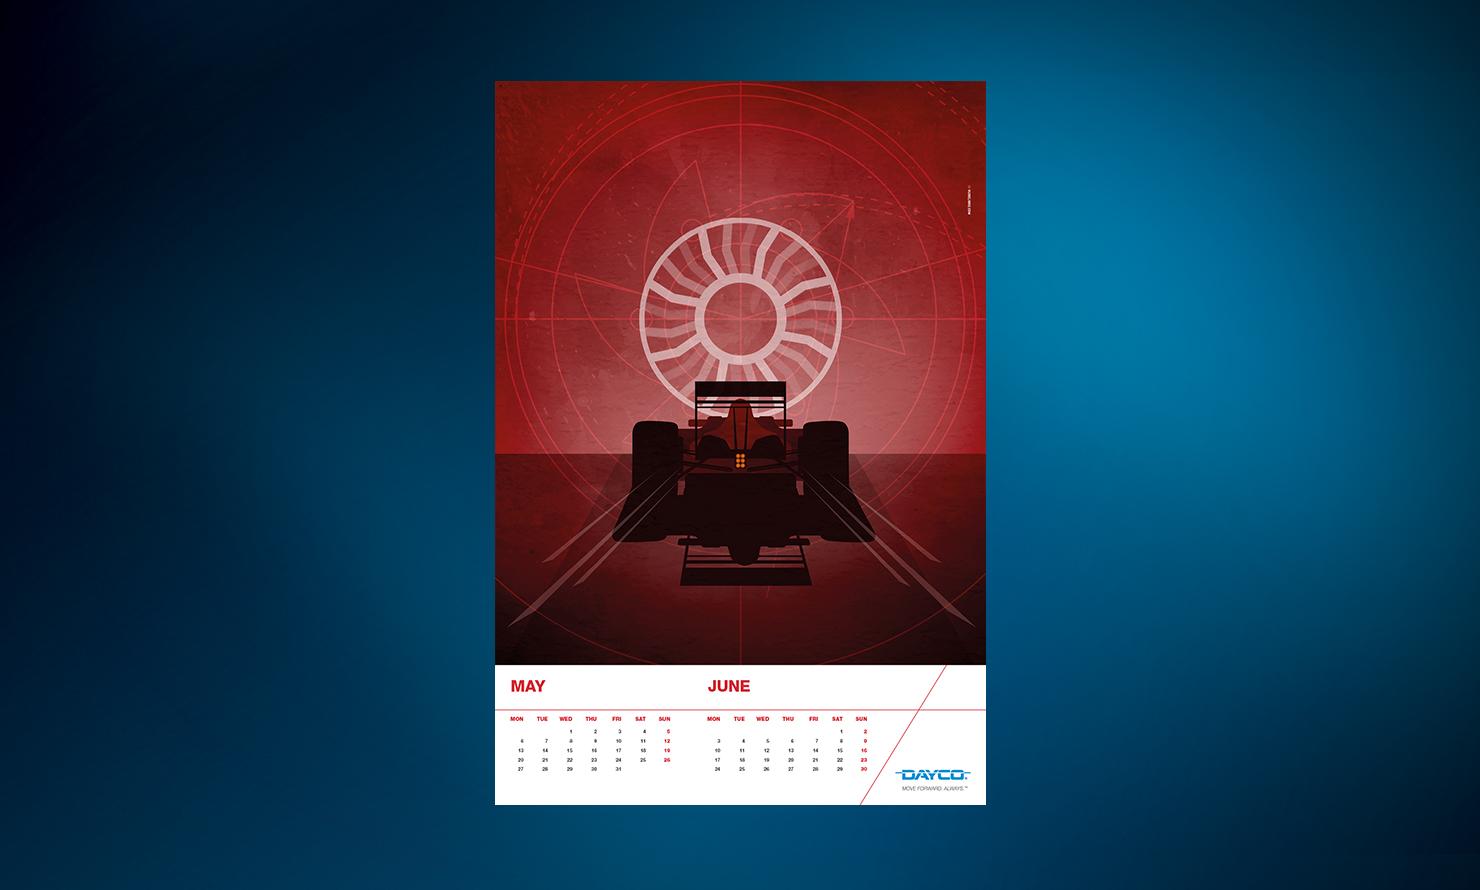 https://www.kubelibre.com/uploads/Slider-work-tutti-clienti/dayco-calendario-2019-3.jpg